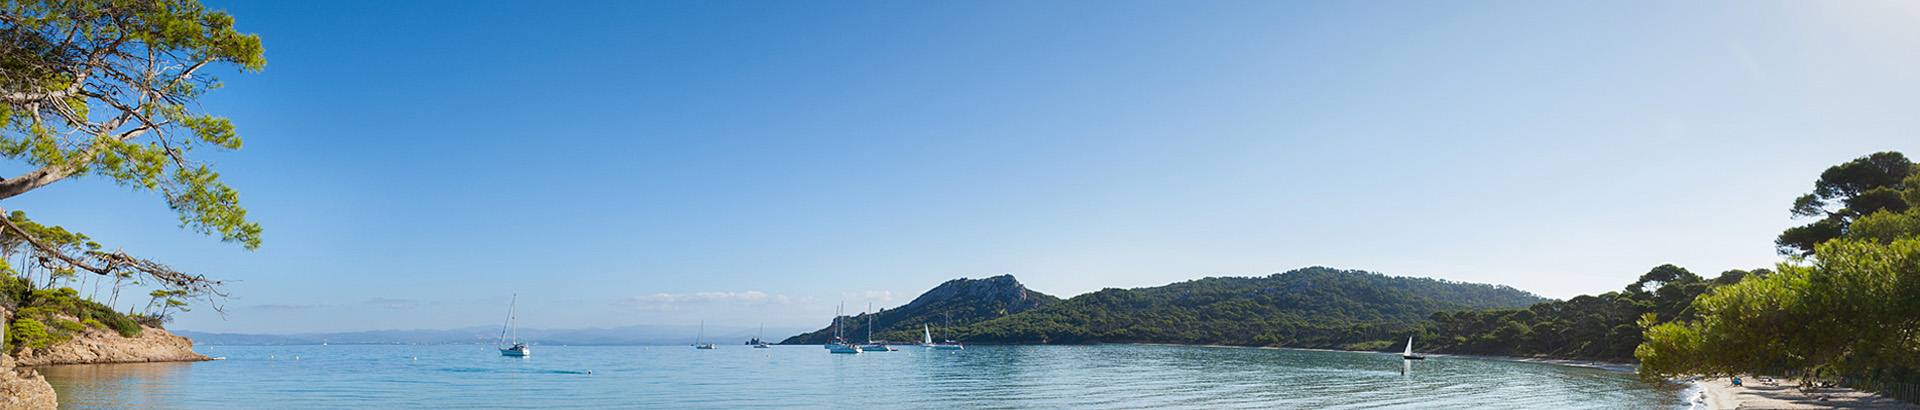 Bord de mer Toulon - Carqueiranne